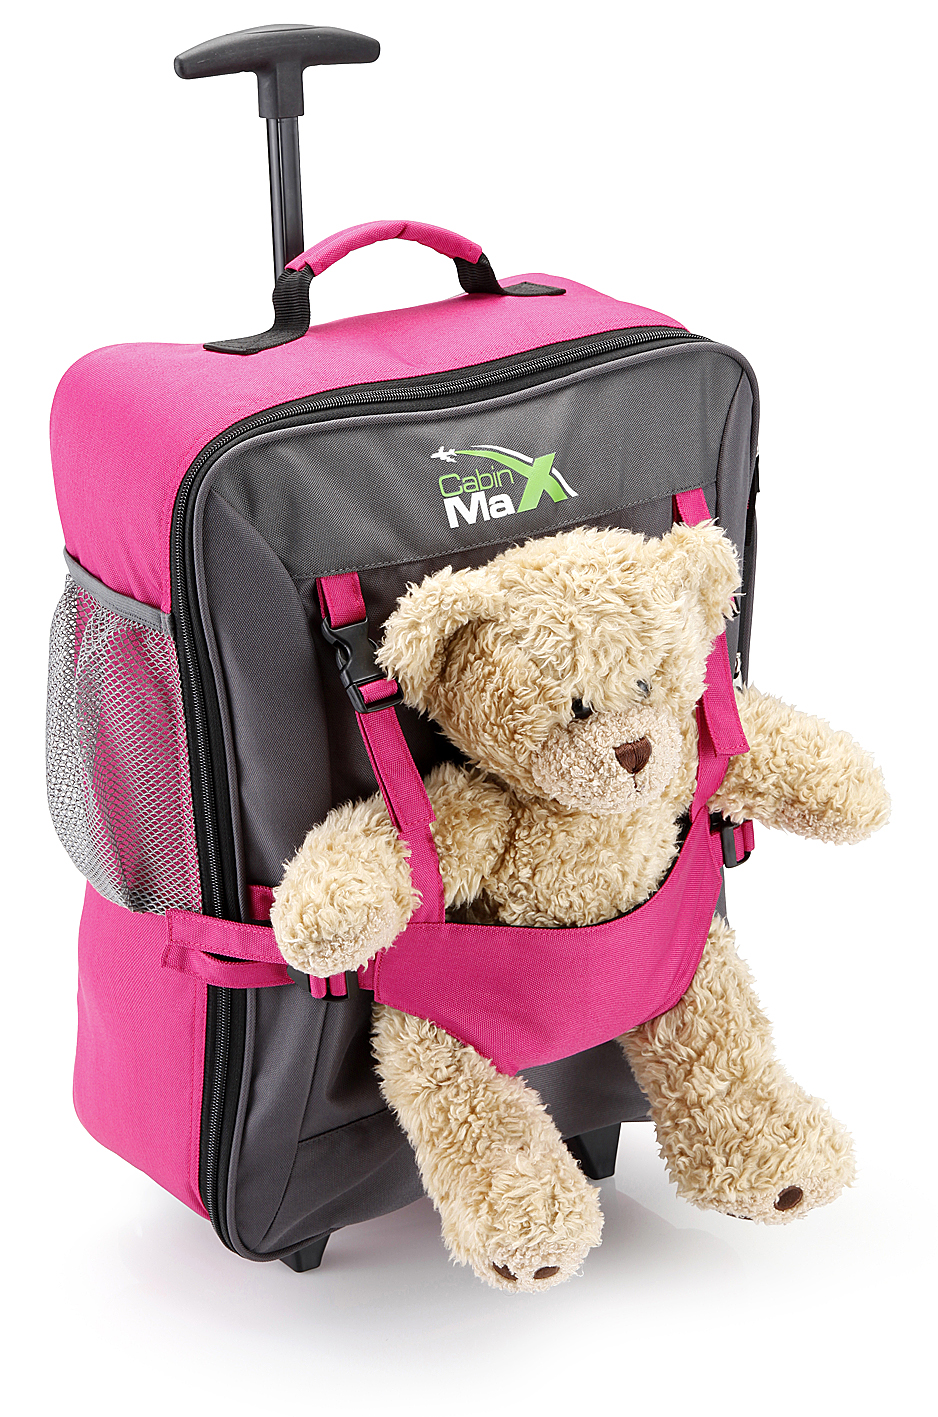 Cabinmax handbagage kinderen - PRMatters